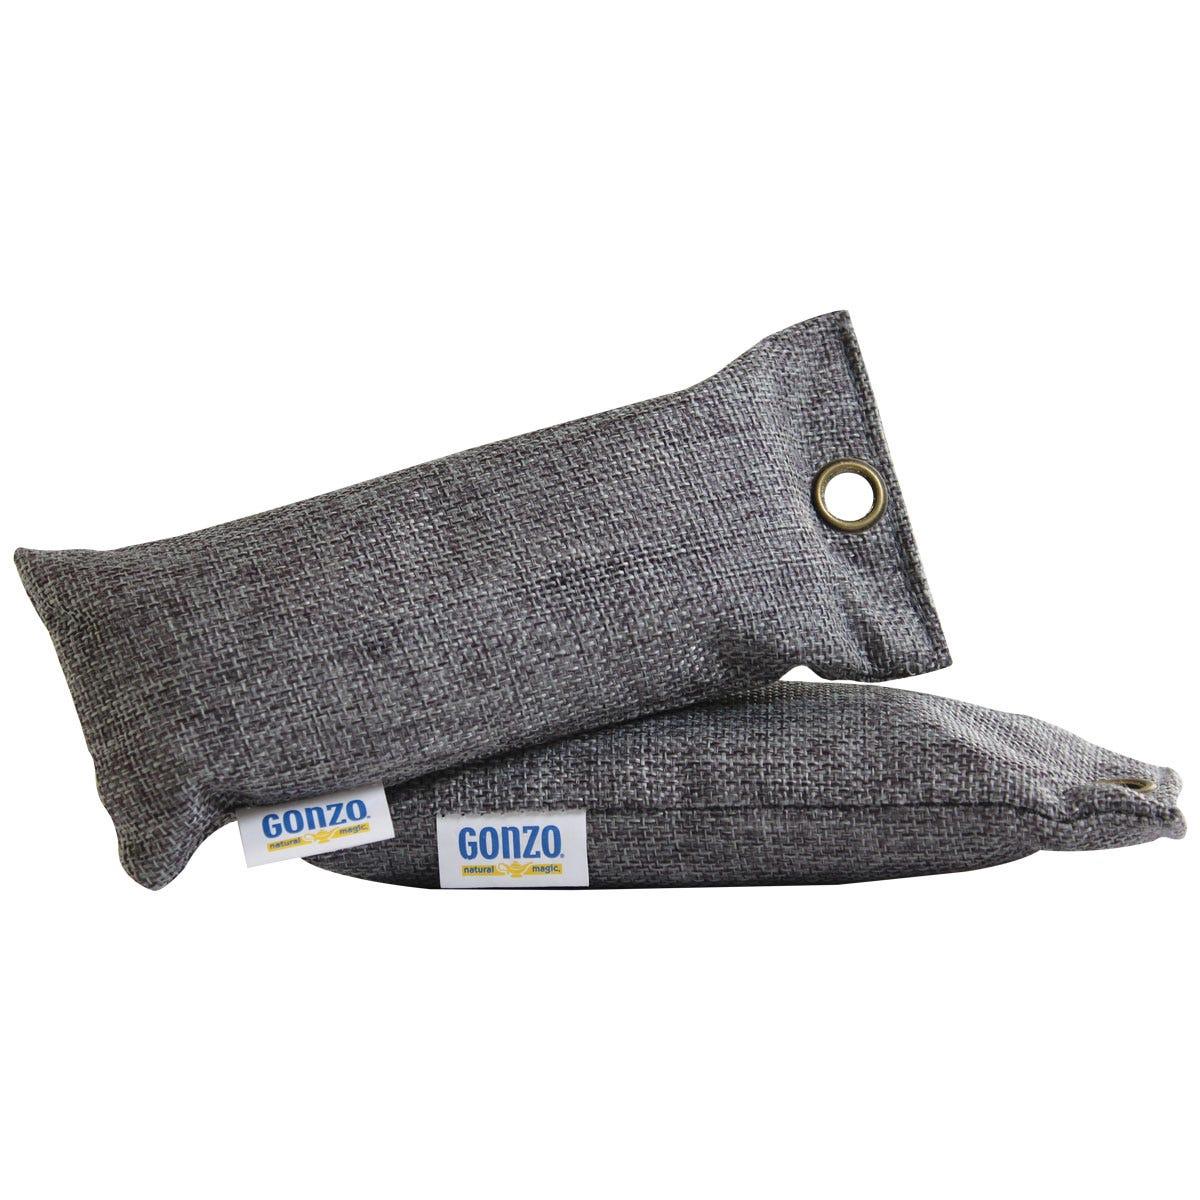 https://googone.com/media/catalog/product/g/y/gym-bag-odor-eliminator_bags.jpg